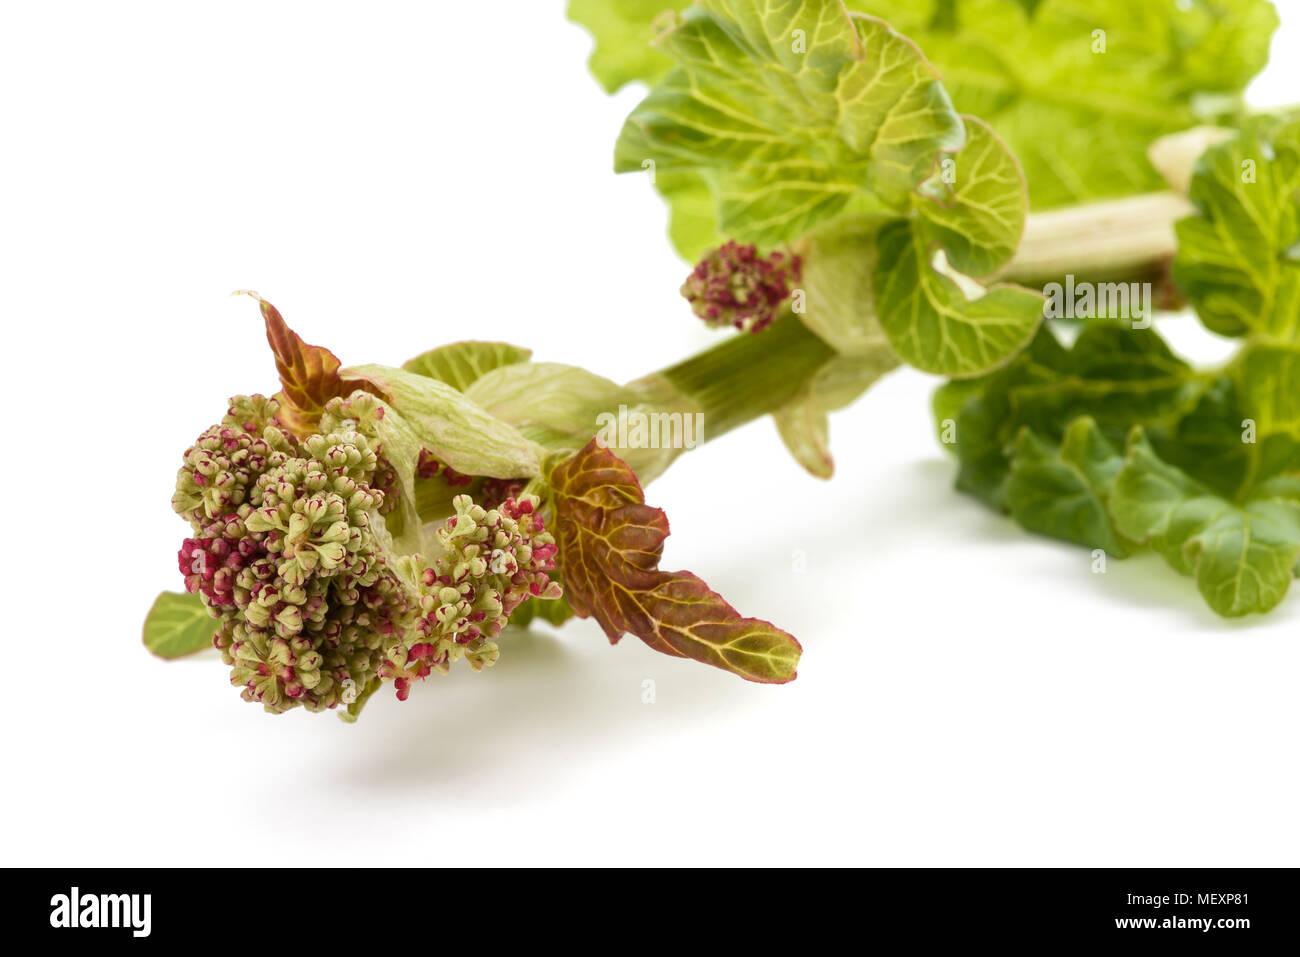 Rhubarb plant (Rheum rhabarbarum) in blossom. flowering Rheum rhabarbarum in a vegetable garden - Stock Image